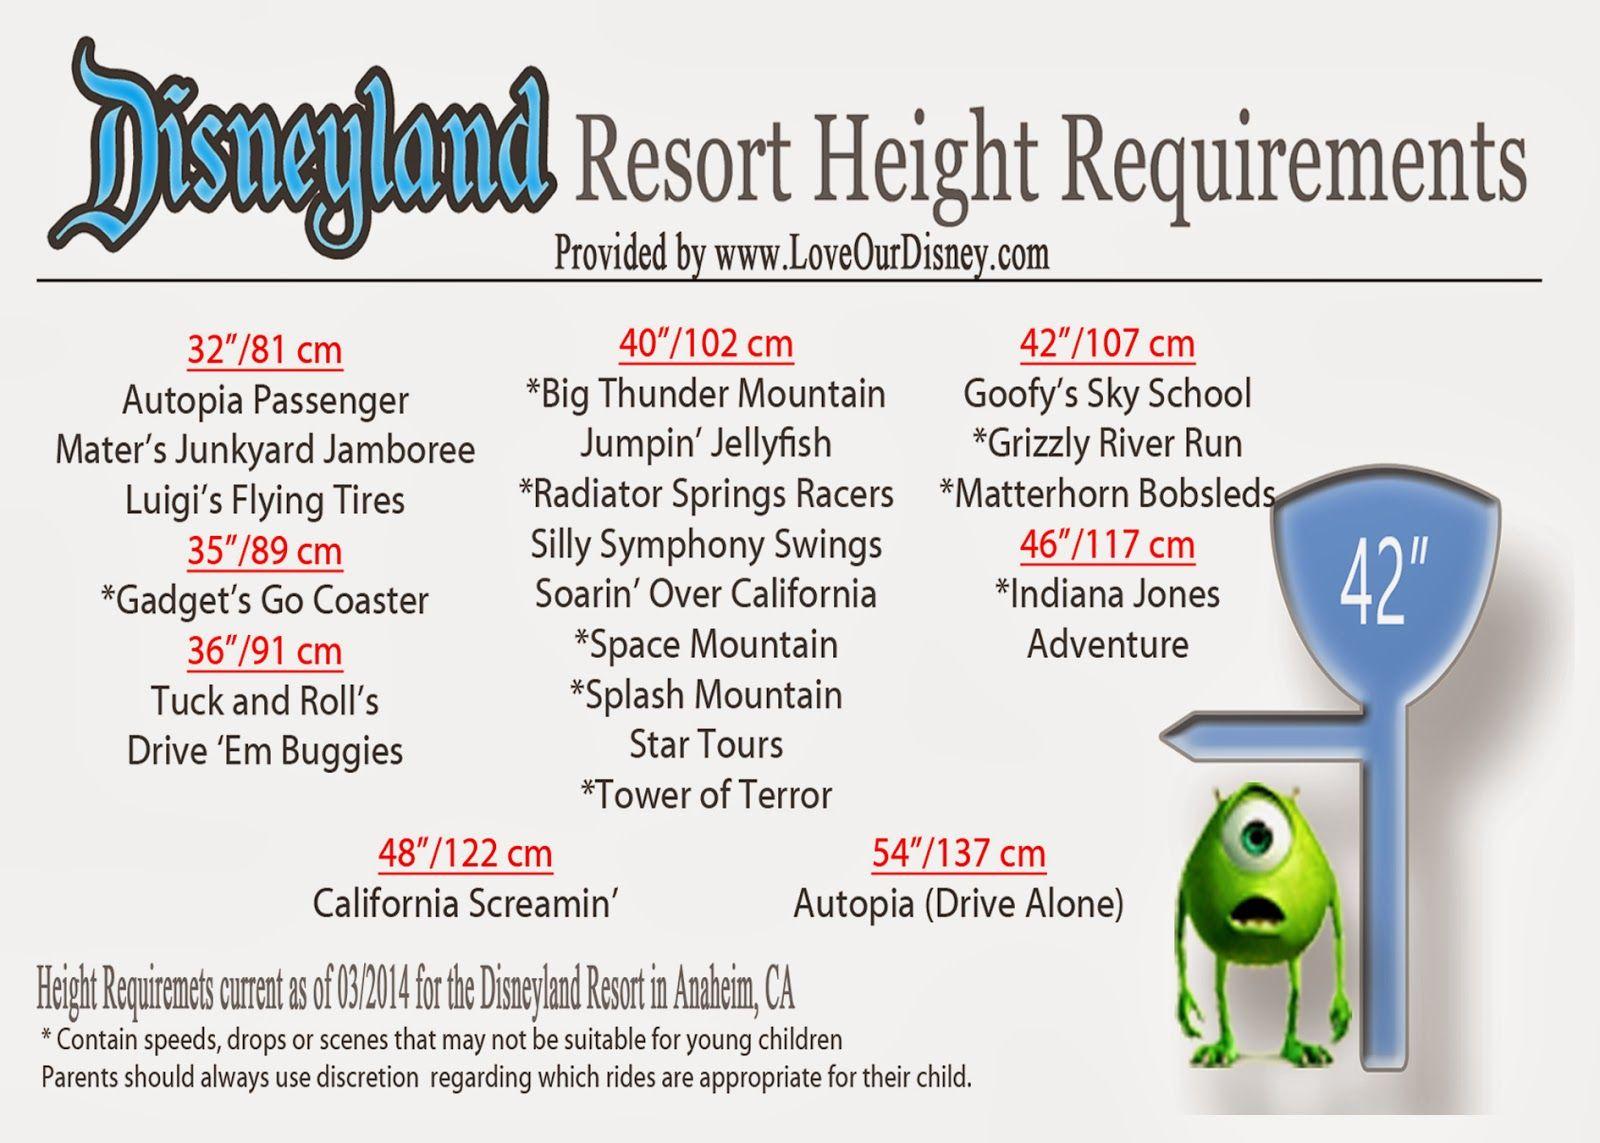 Disneyland Height Requirements Printable | Disneyland Rides